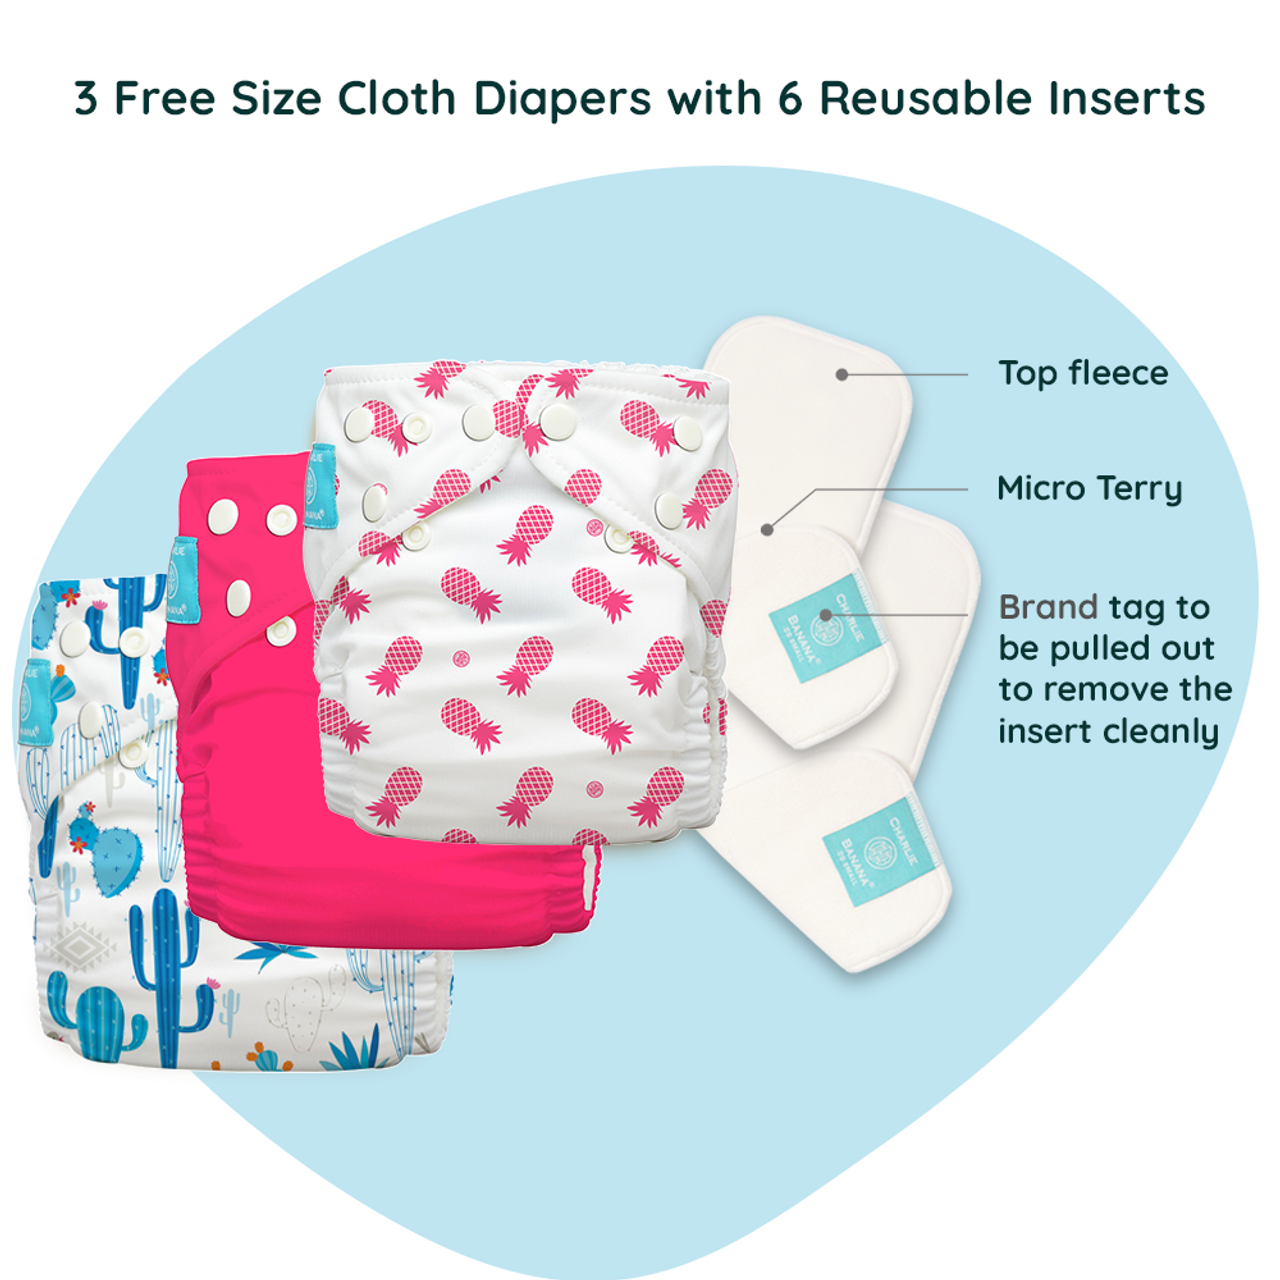 Free Size Cloth Diaper - Super Saver Pack of 3 - Pina Colada